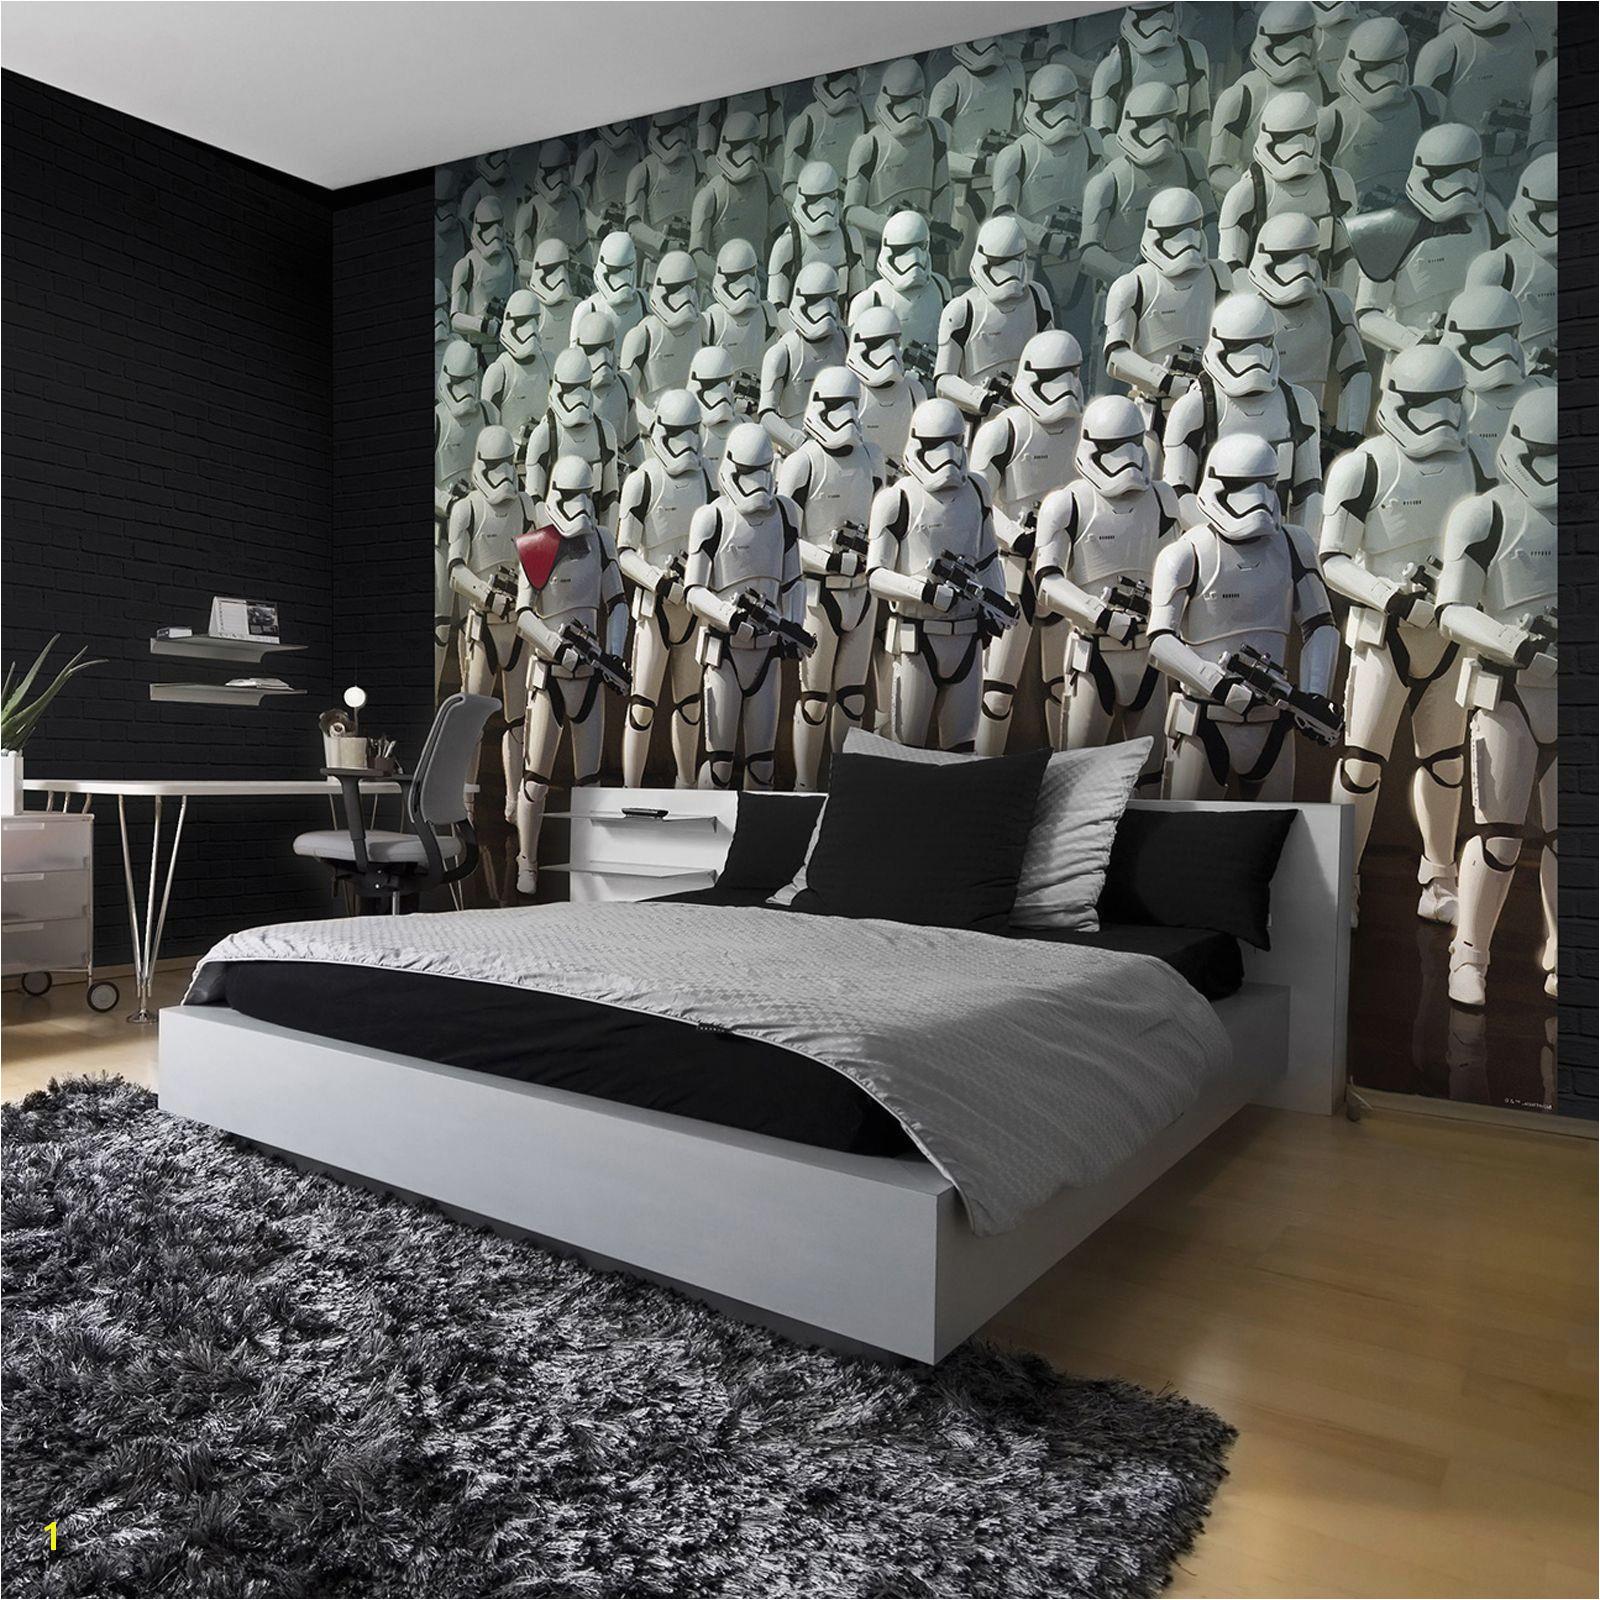 Star Wars Stormtrooper Wall Mural dream bedroom …